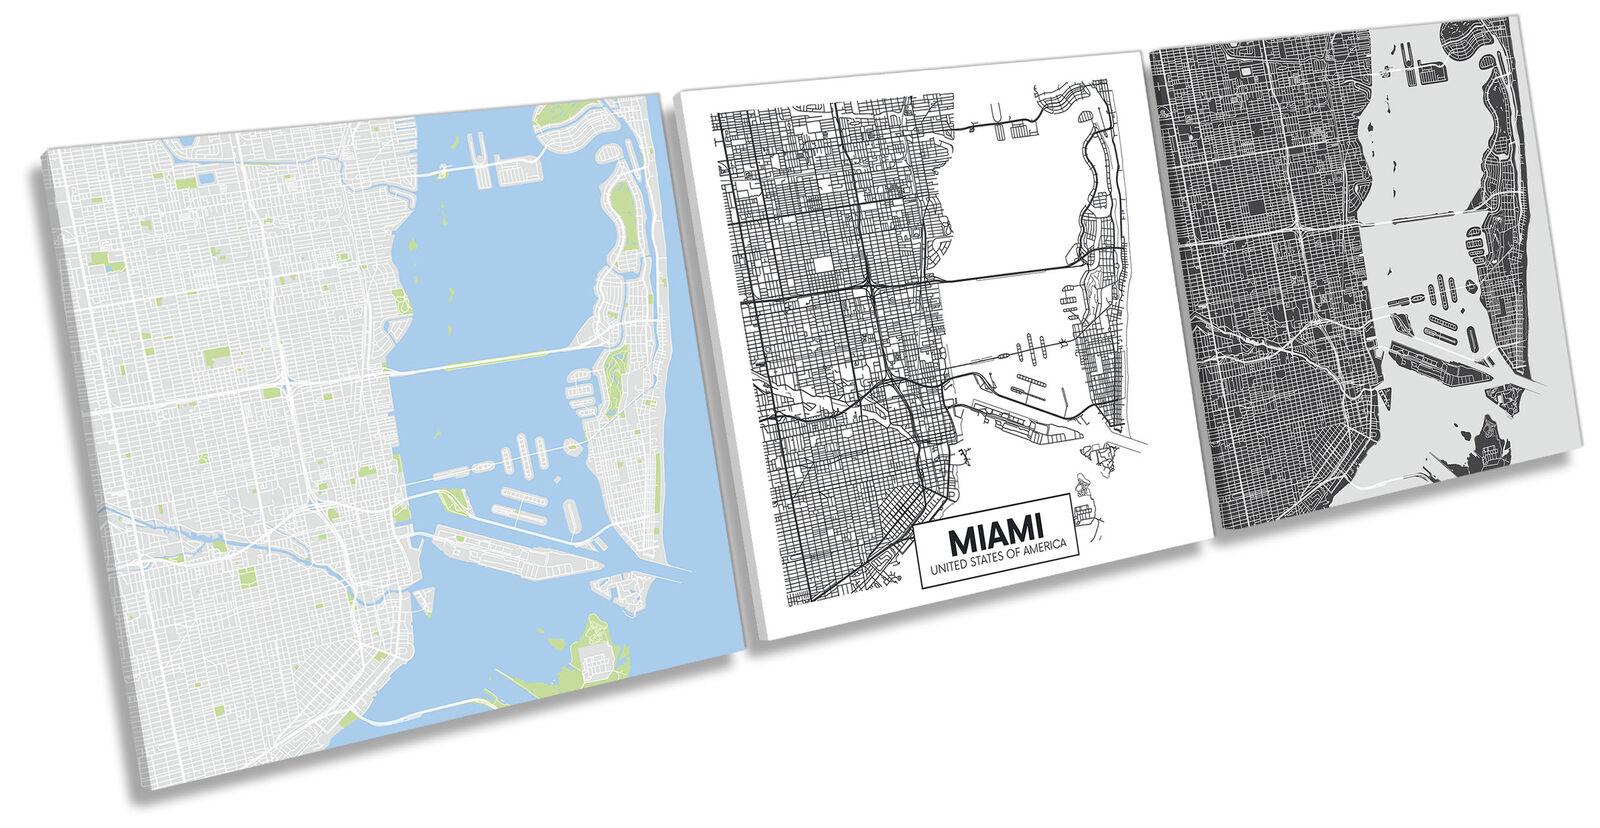 Miami US City Map Set of 3 CANVAS WALL ART Print Treble Multi-Colourot